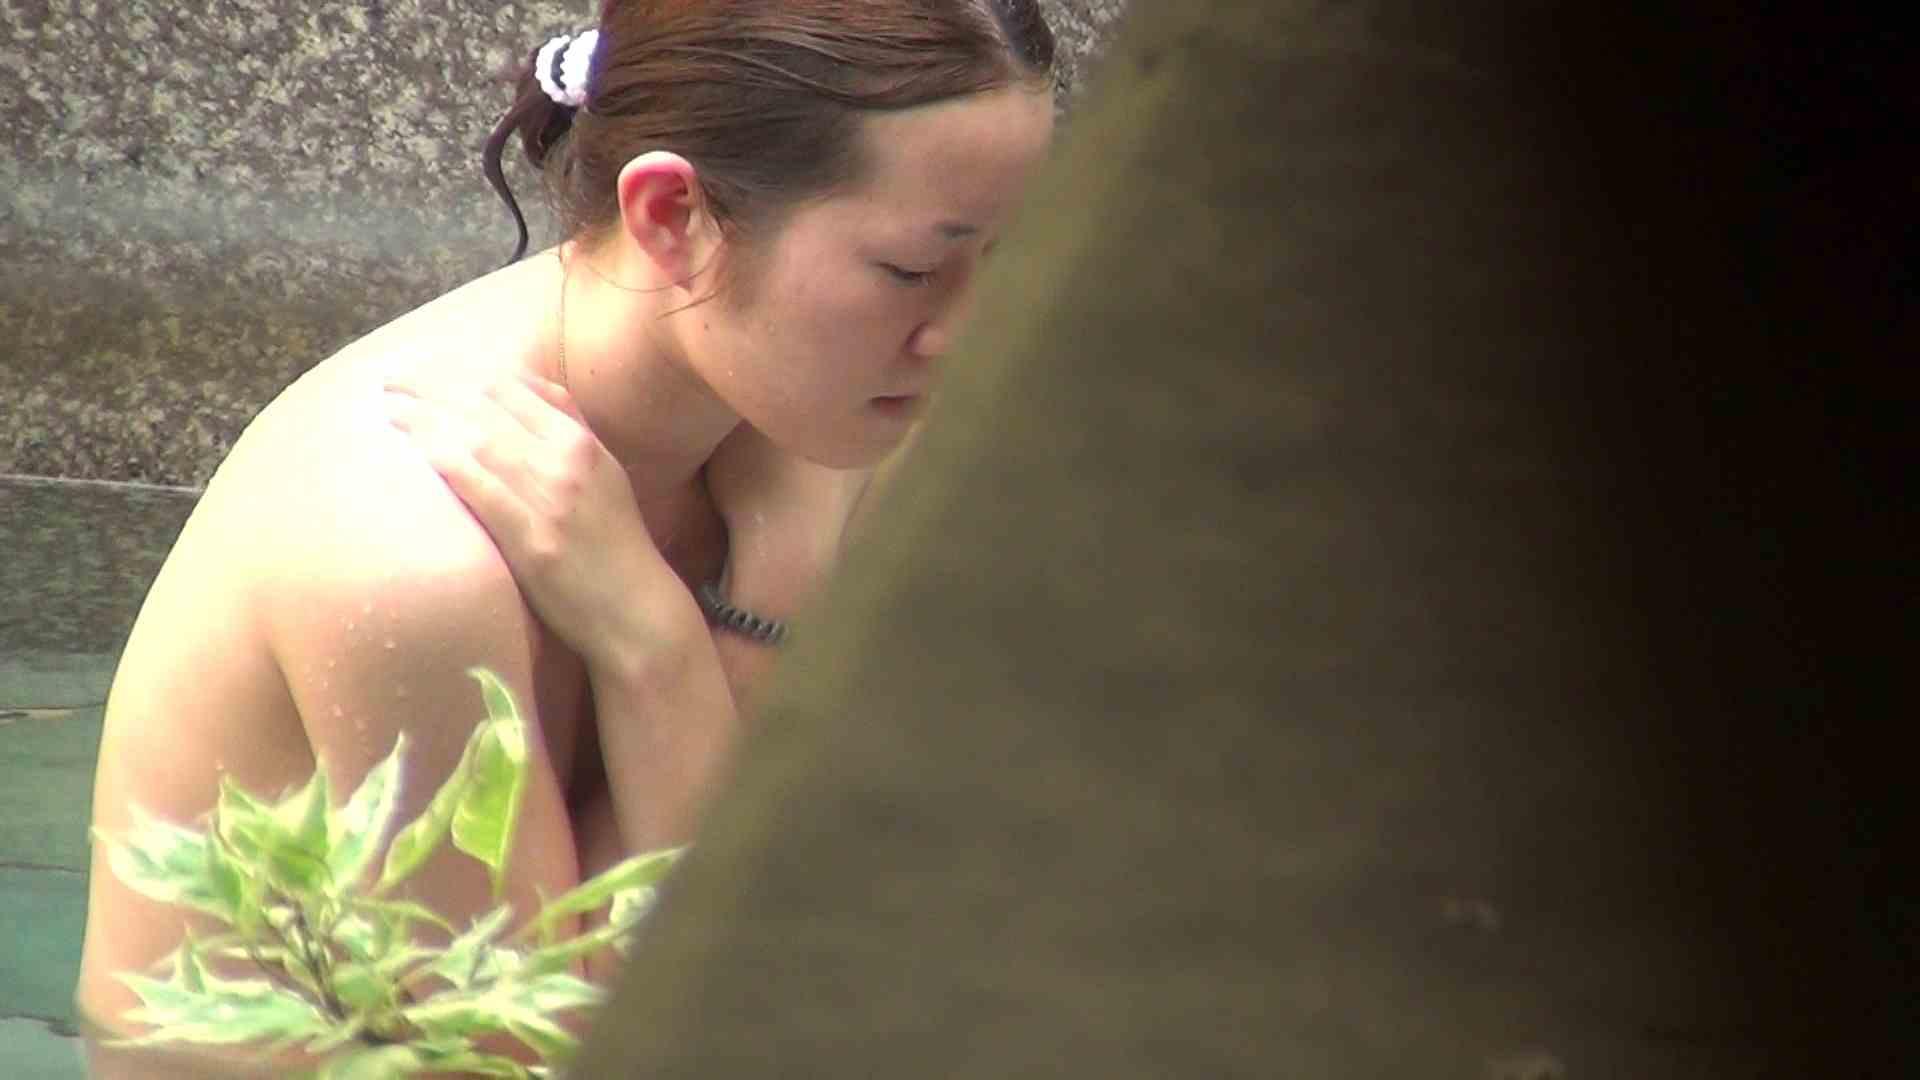 Aquaな露天風呂Vol.263 露天 | 盗撮特撮  11pic 7